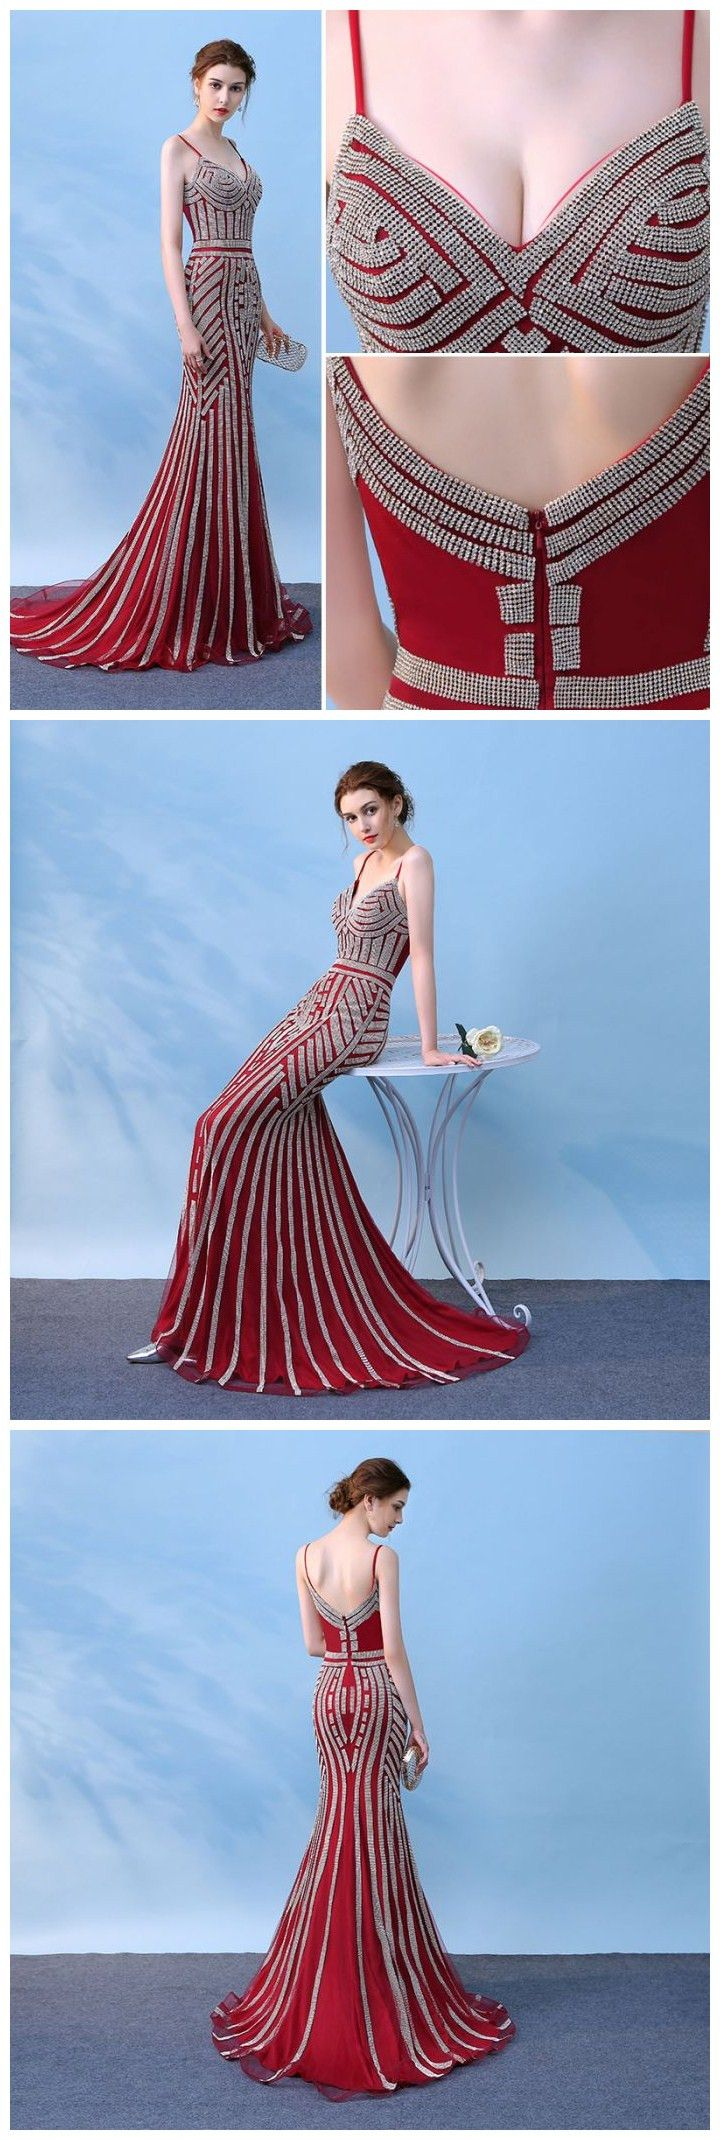 Mermaid spaghetti straps burgundy long prom dress chic evening party